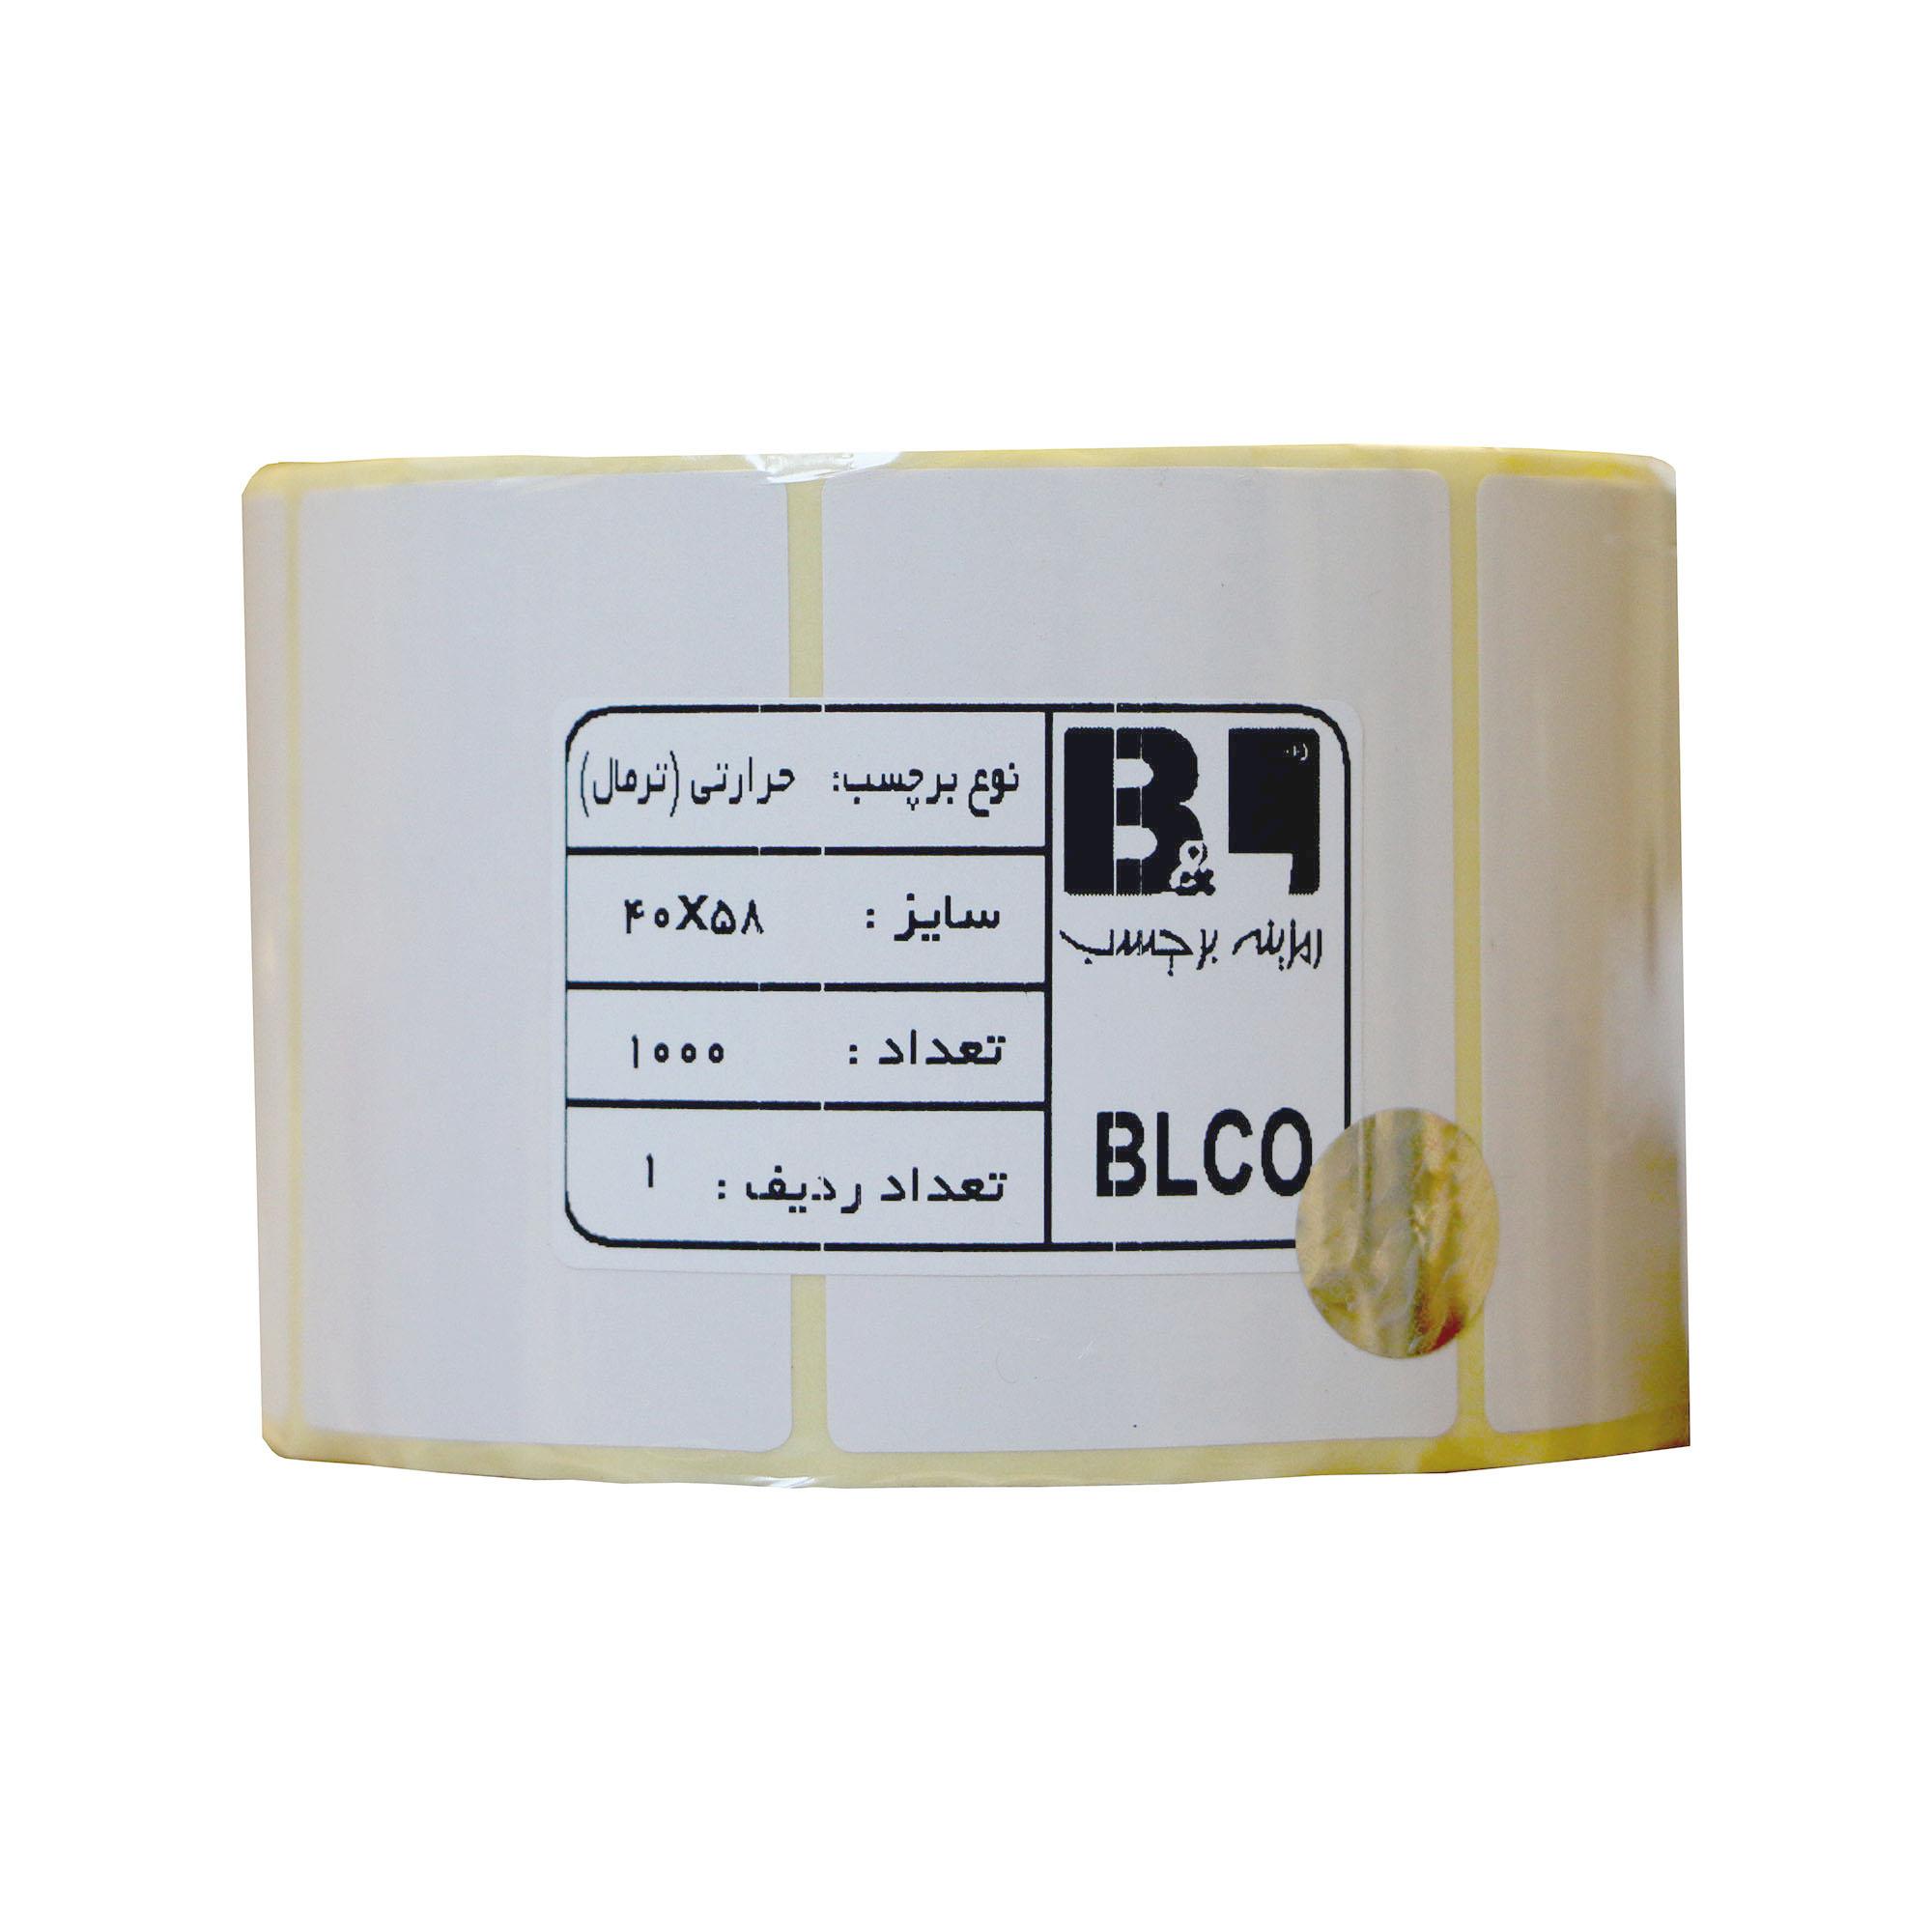 برچسب پرینتر لیبل زن  رمزینه برچسب مدل 1000-BLCO 4058